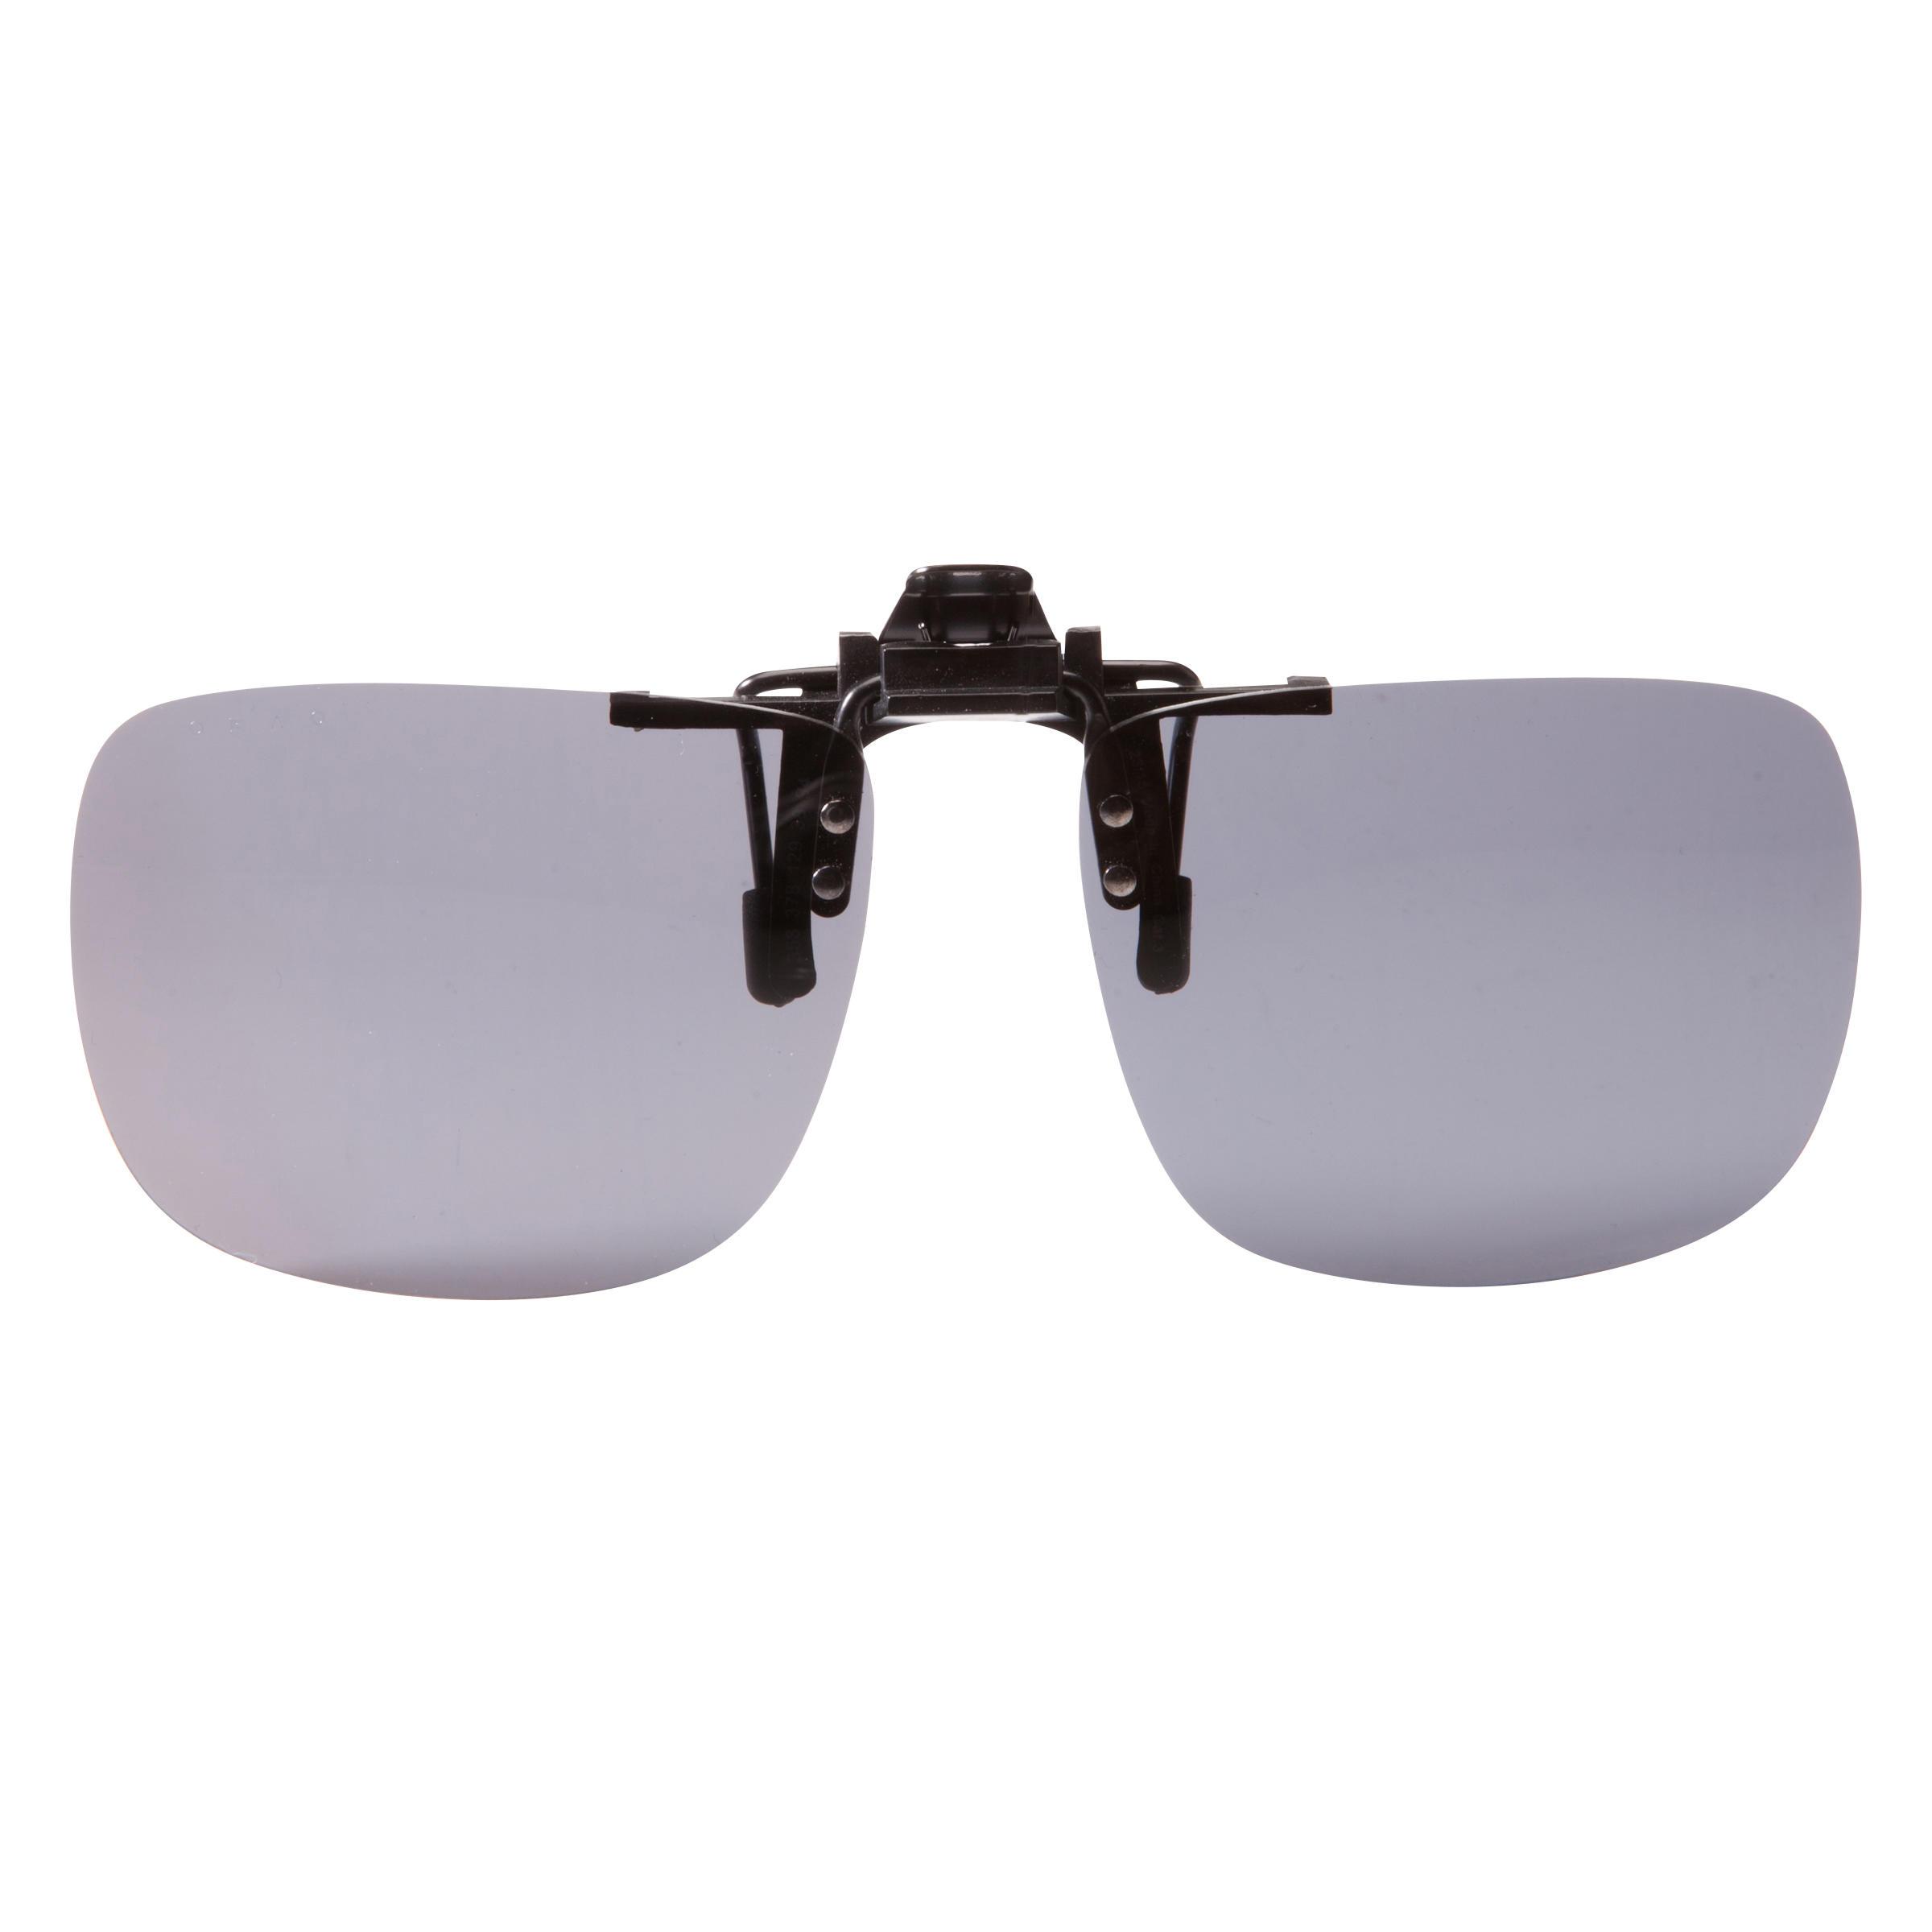 Orao Polariserende zonneclip Vision 300 voor bril op sterkte, categorie 3 thumbnail